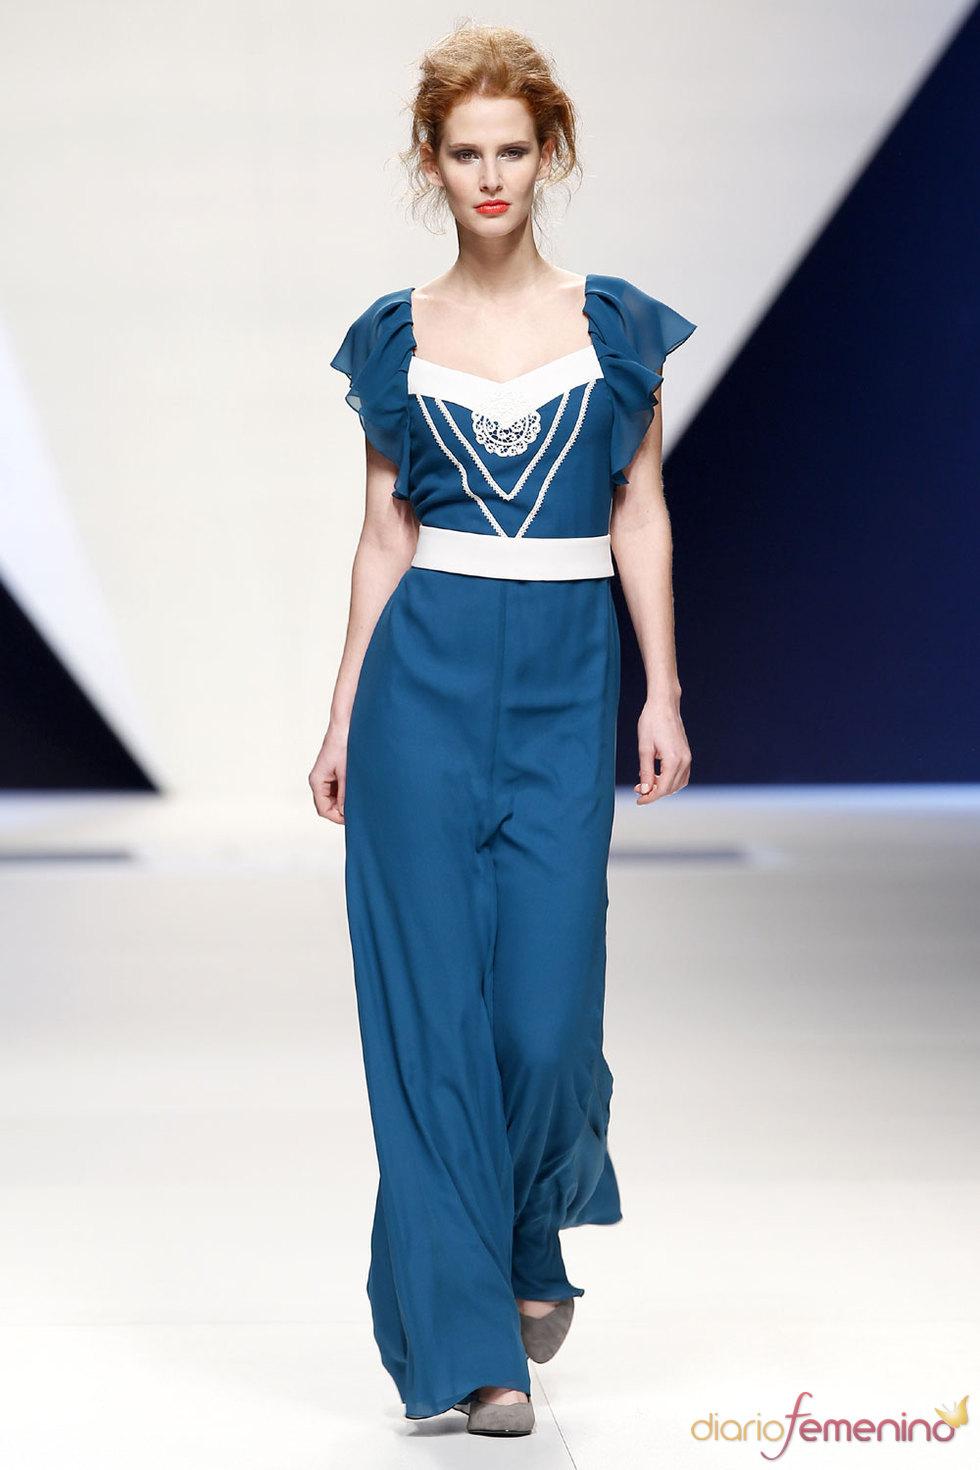 Moda BEBA'S CLOSET - Fotos Pasarela Cibeles 2010